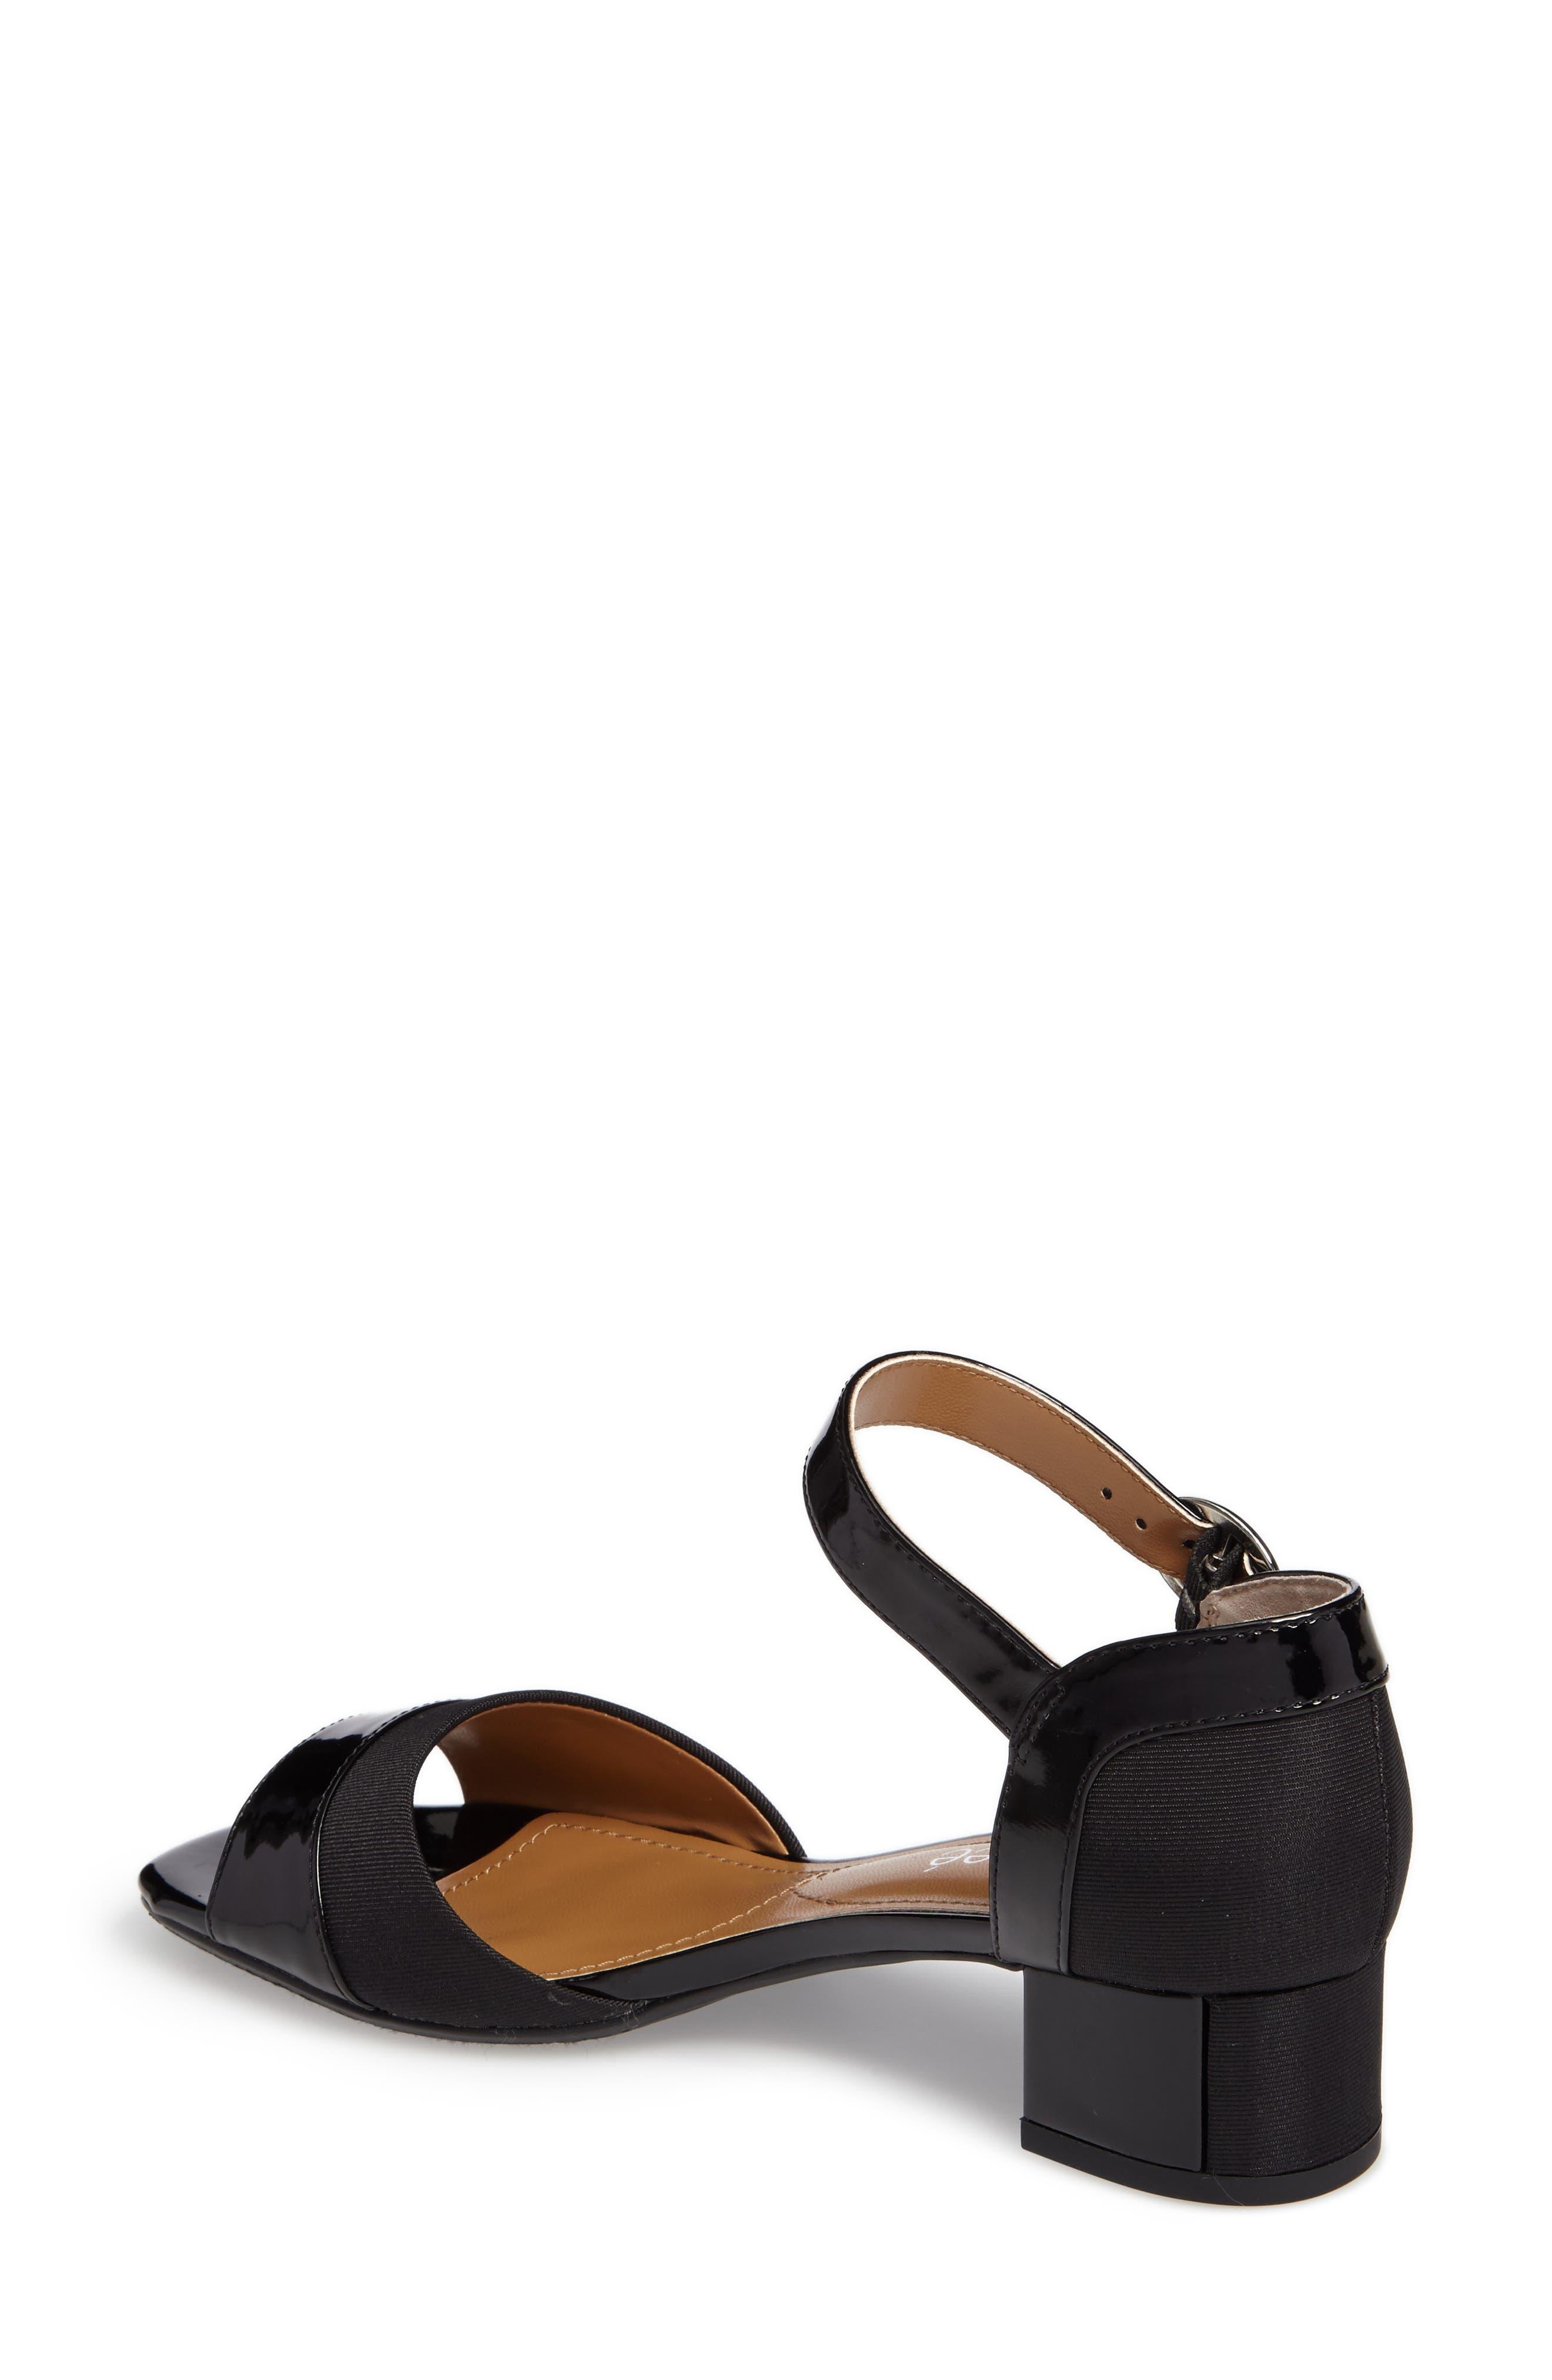 Pebblebeach Block Heel Sandal,                             Alternate thumbnail 2, color,                             001